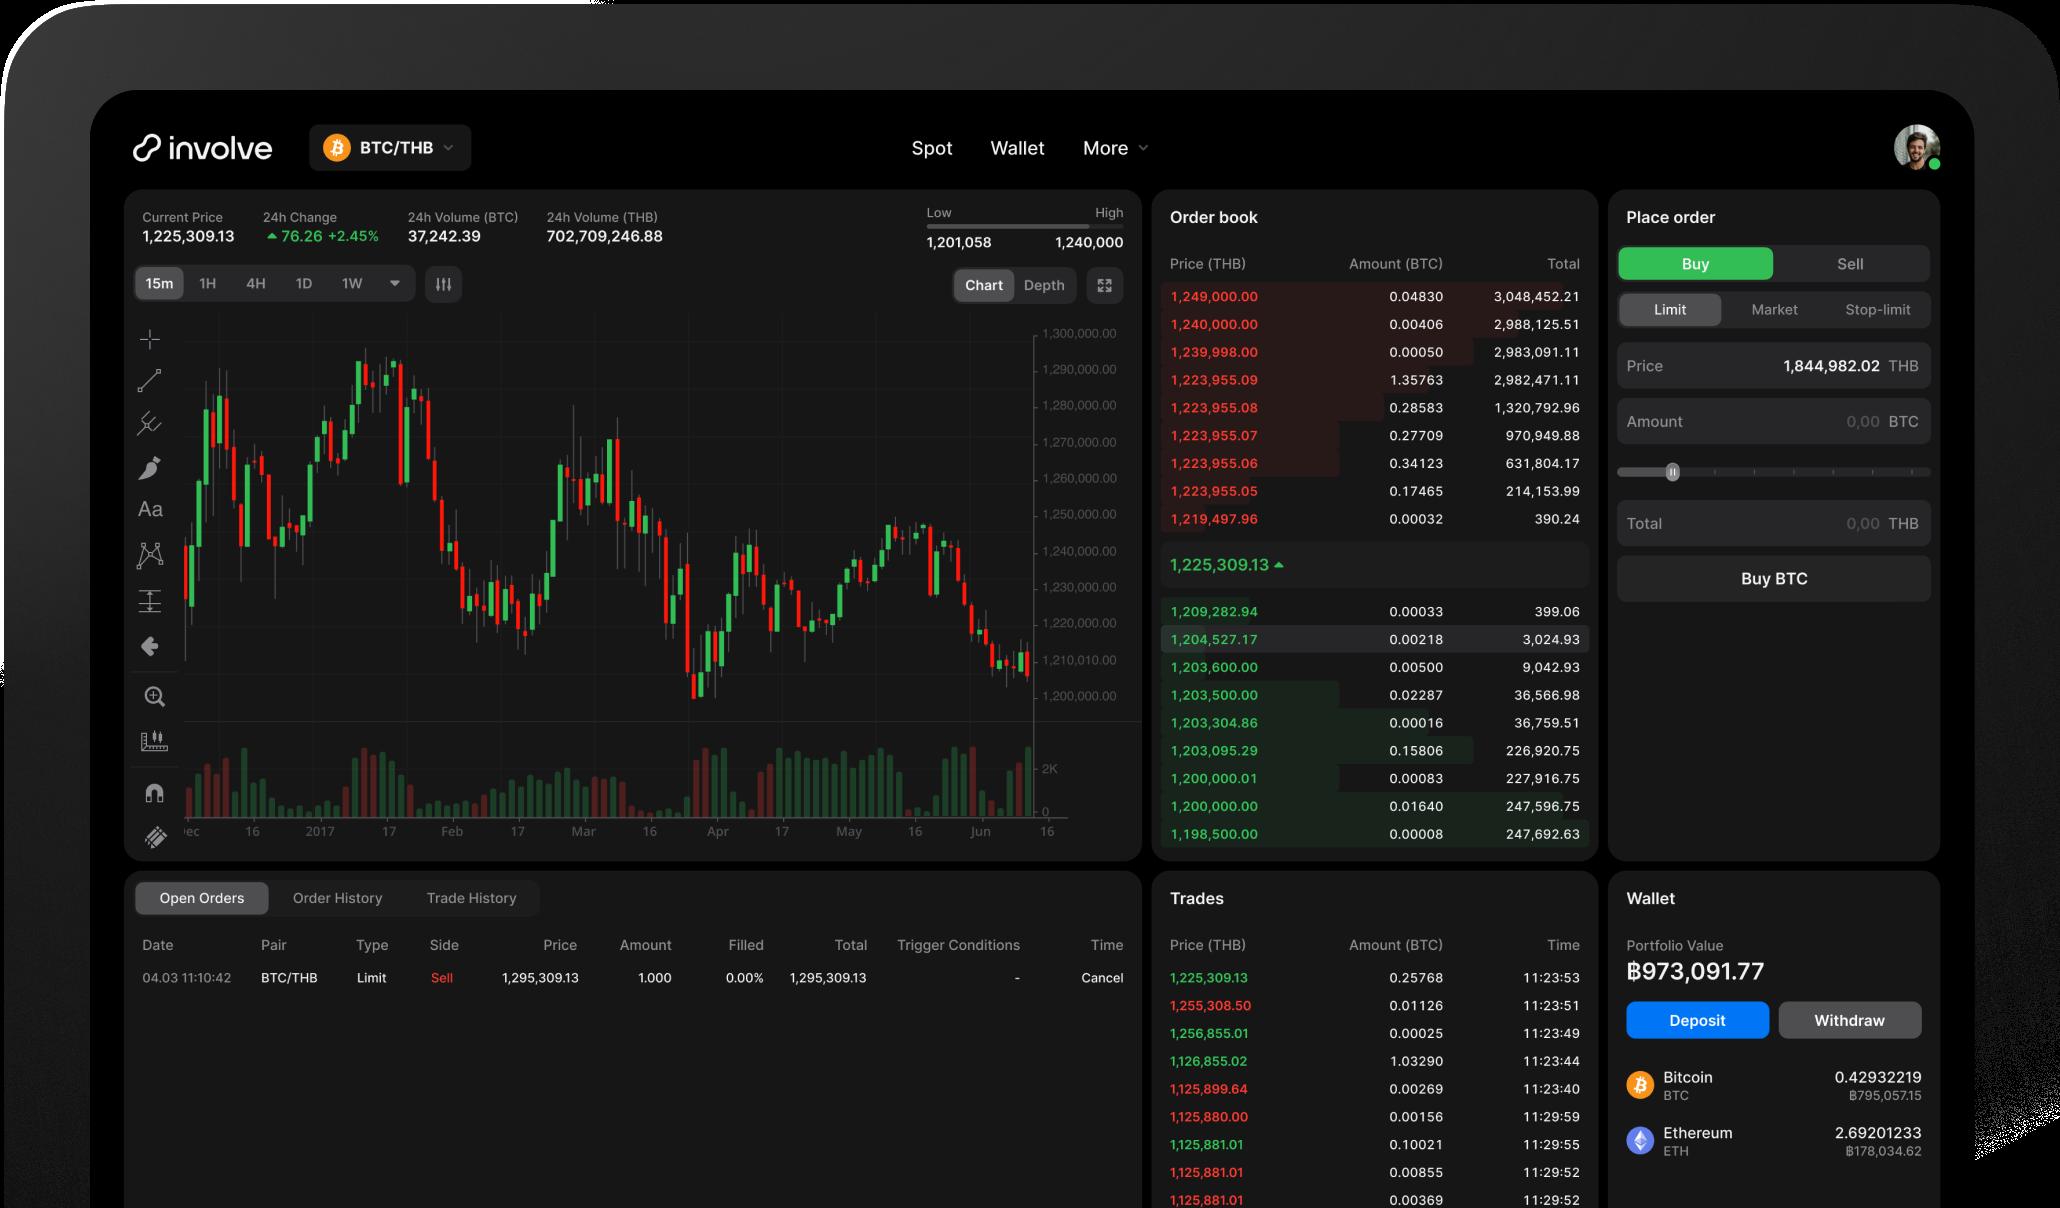 Involve Pro - Advanced Trading Platform